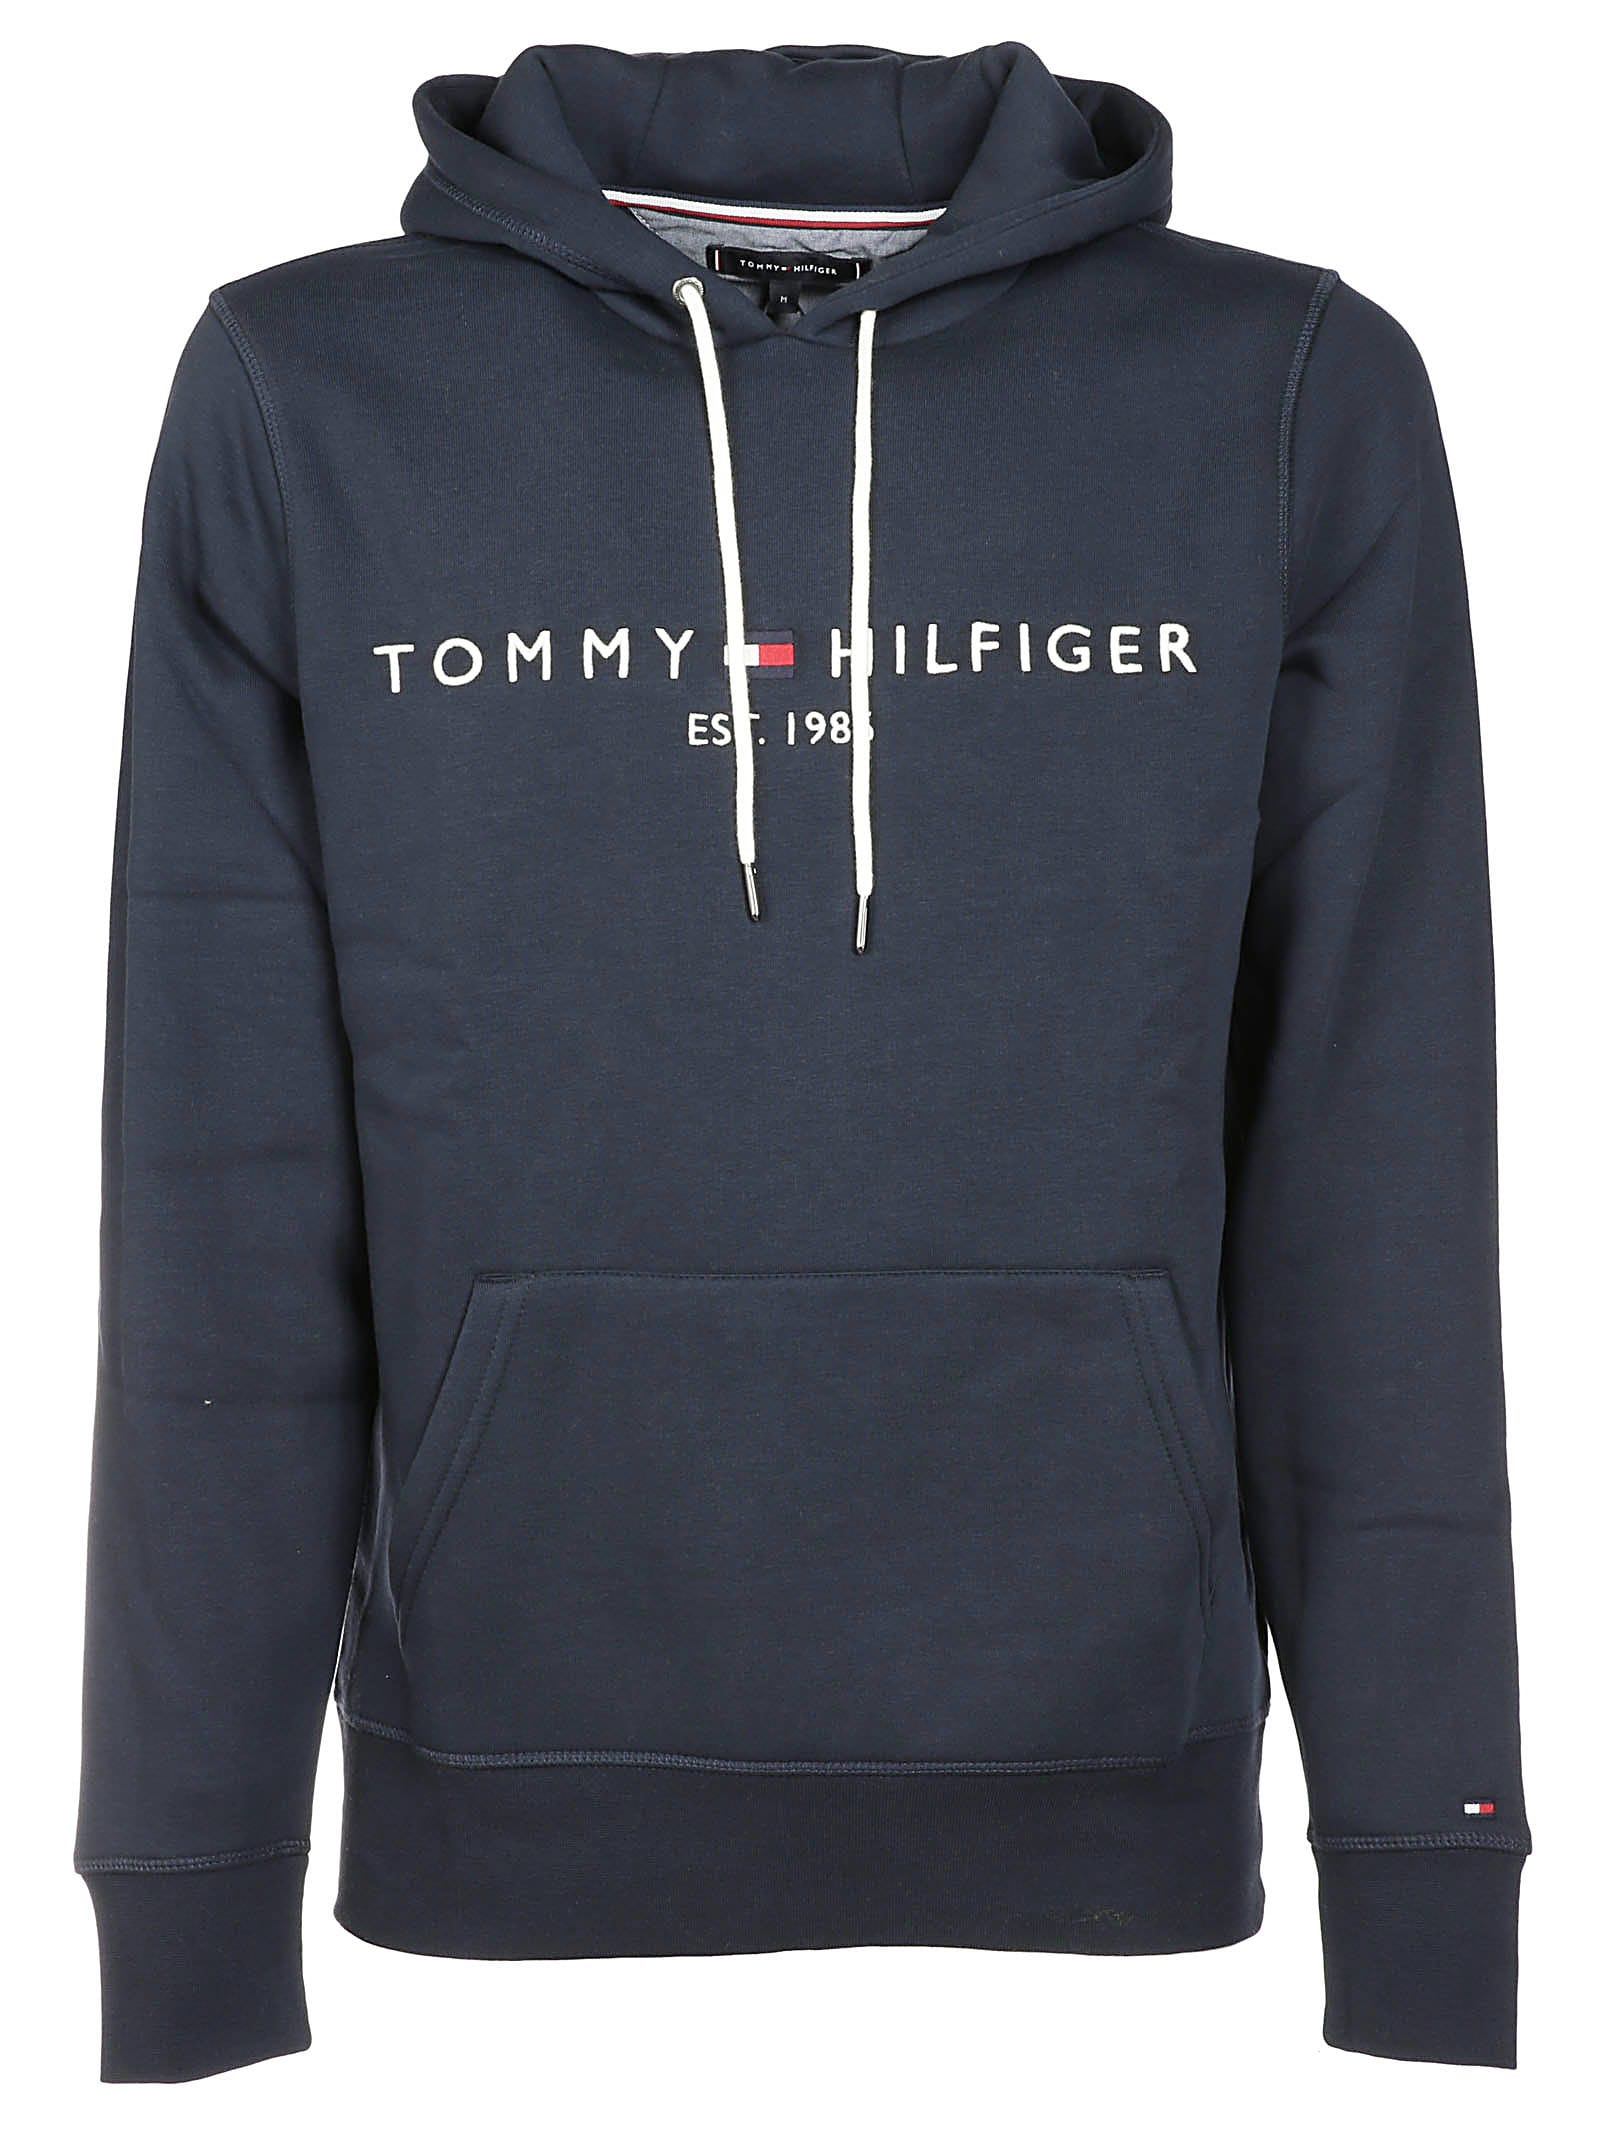 8047b921e1c47 Tommy Hilfiger Logo Hoodie